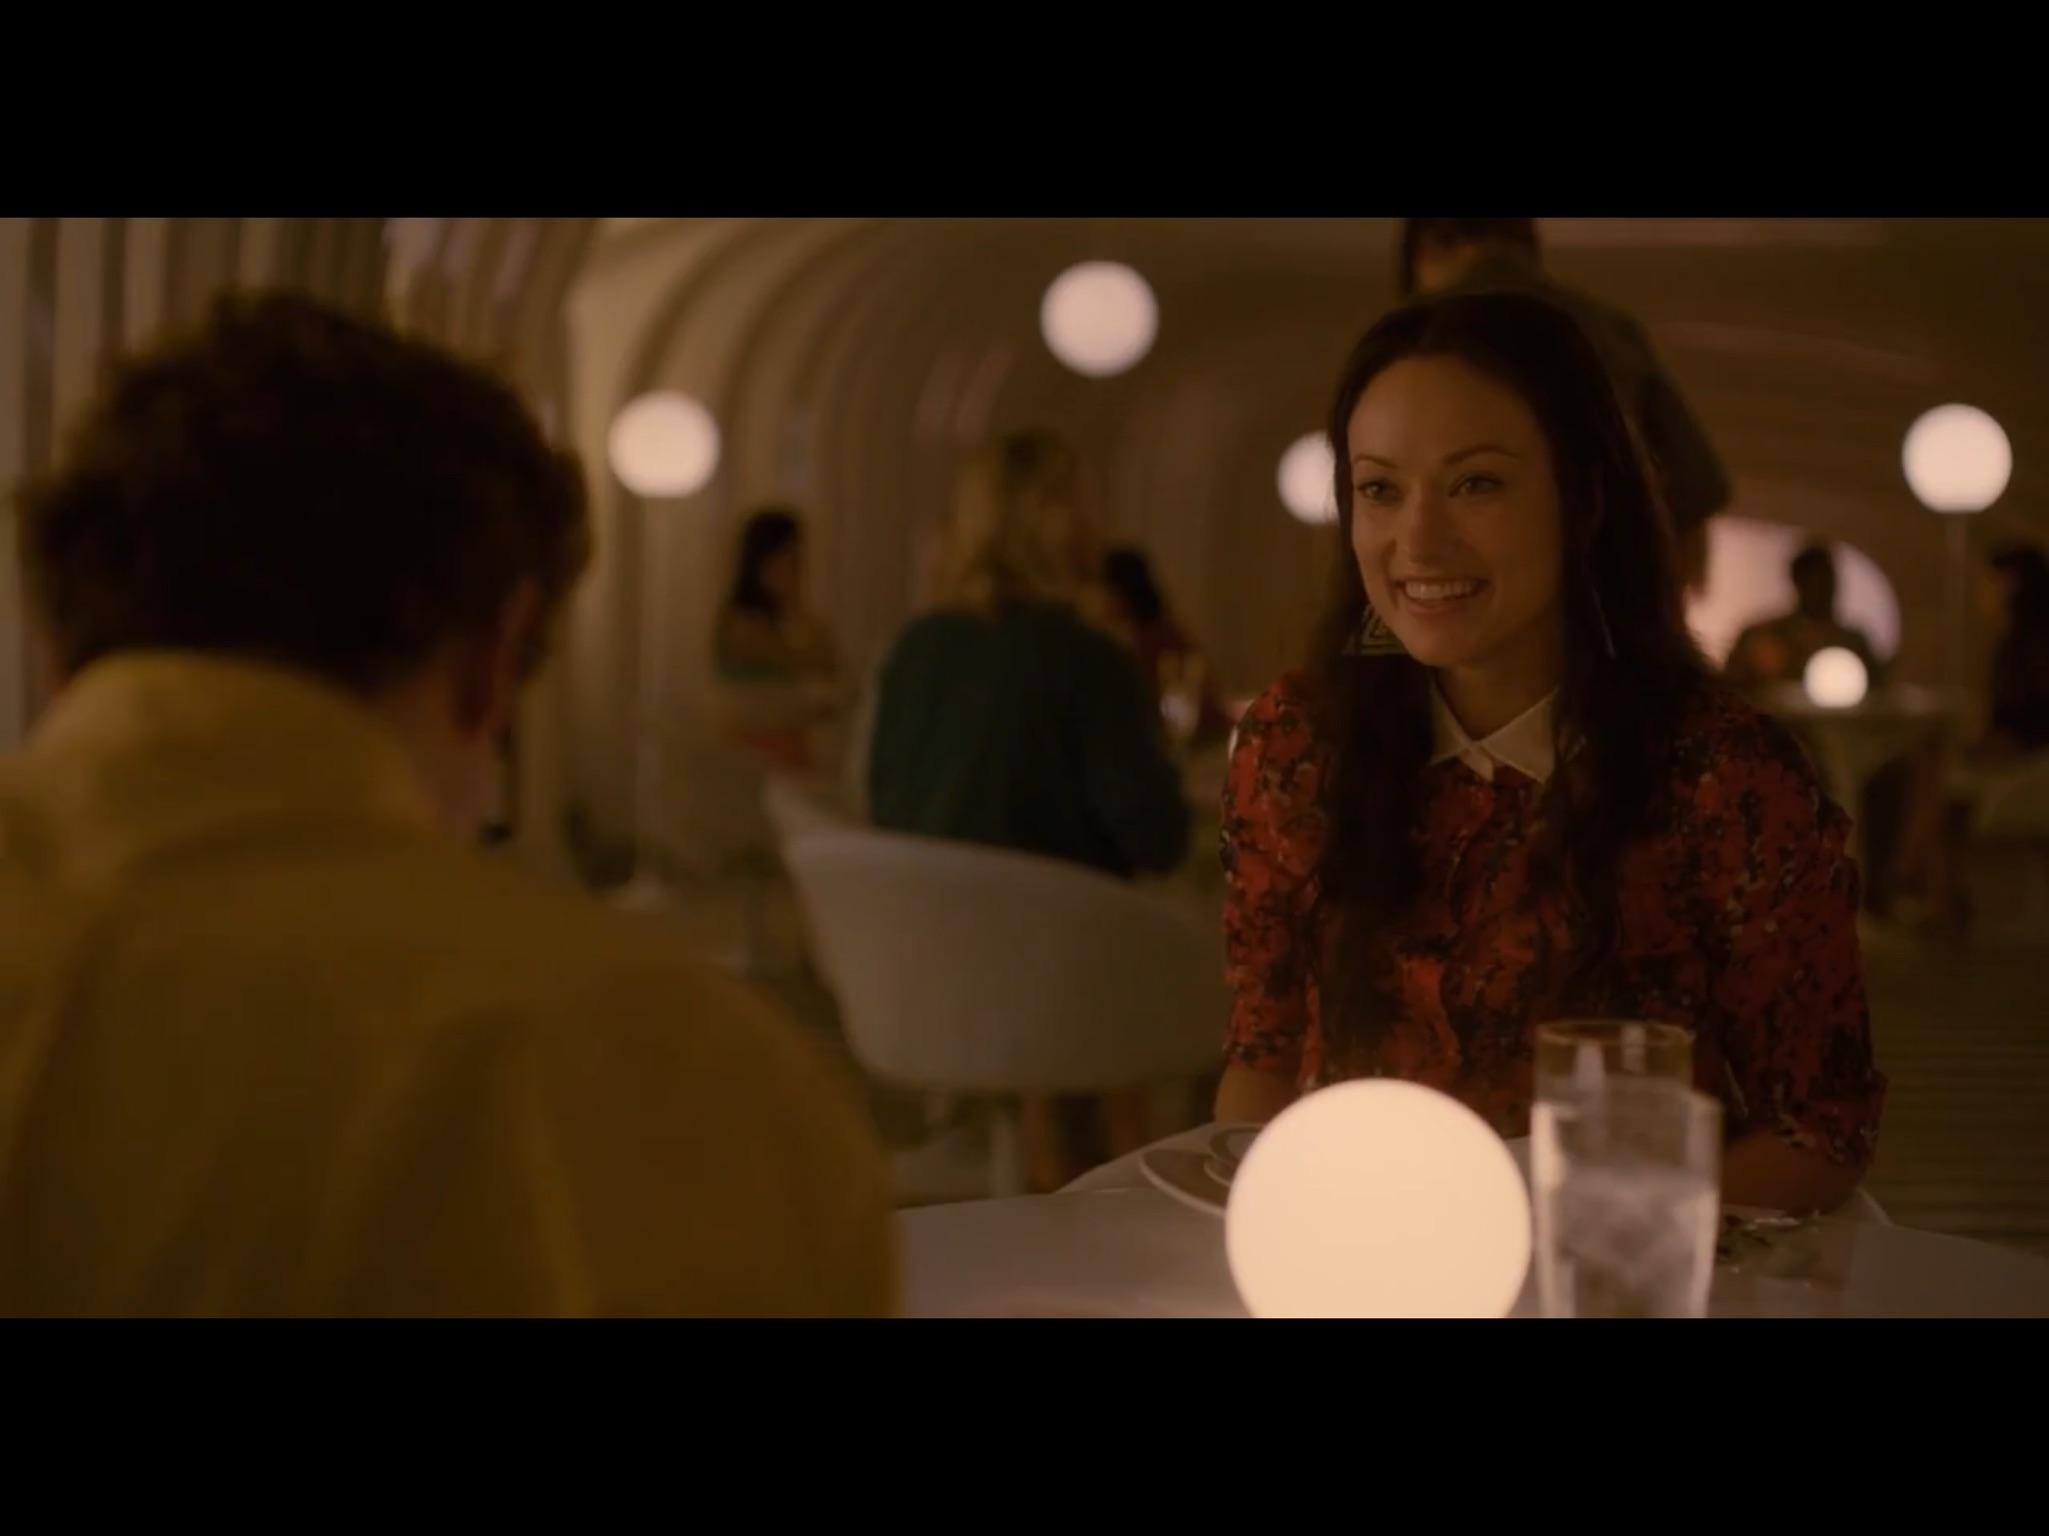 her-movie-2013-screencap-11.JPG